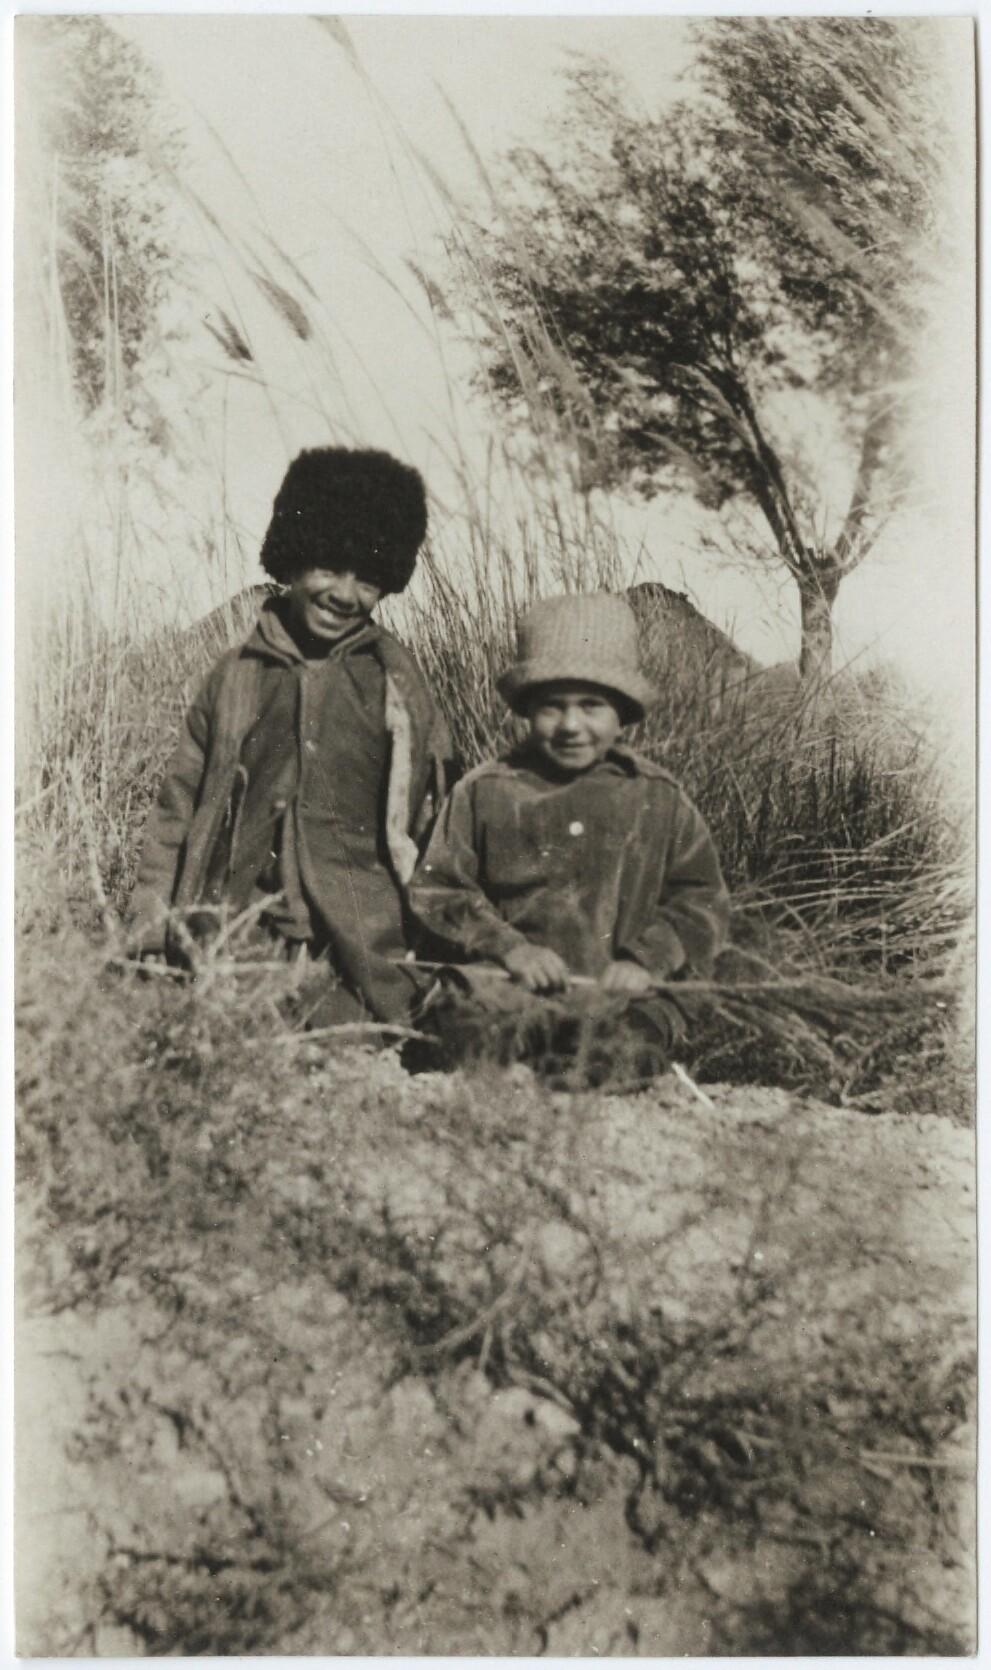 Langston Hughes, A Turkmenian and a Russian child growing up together ... near Merv, Soviet Turkmenia